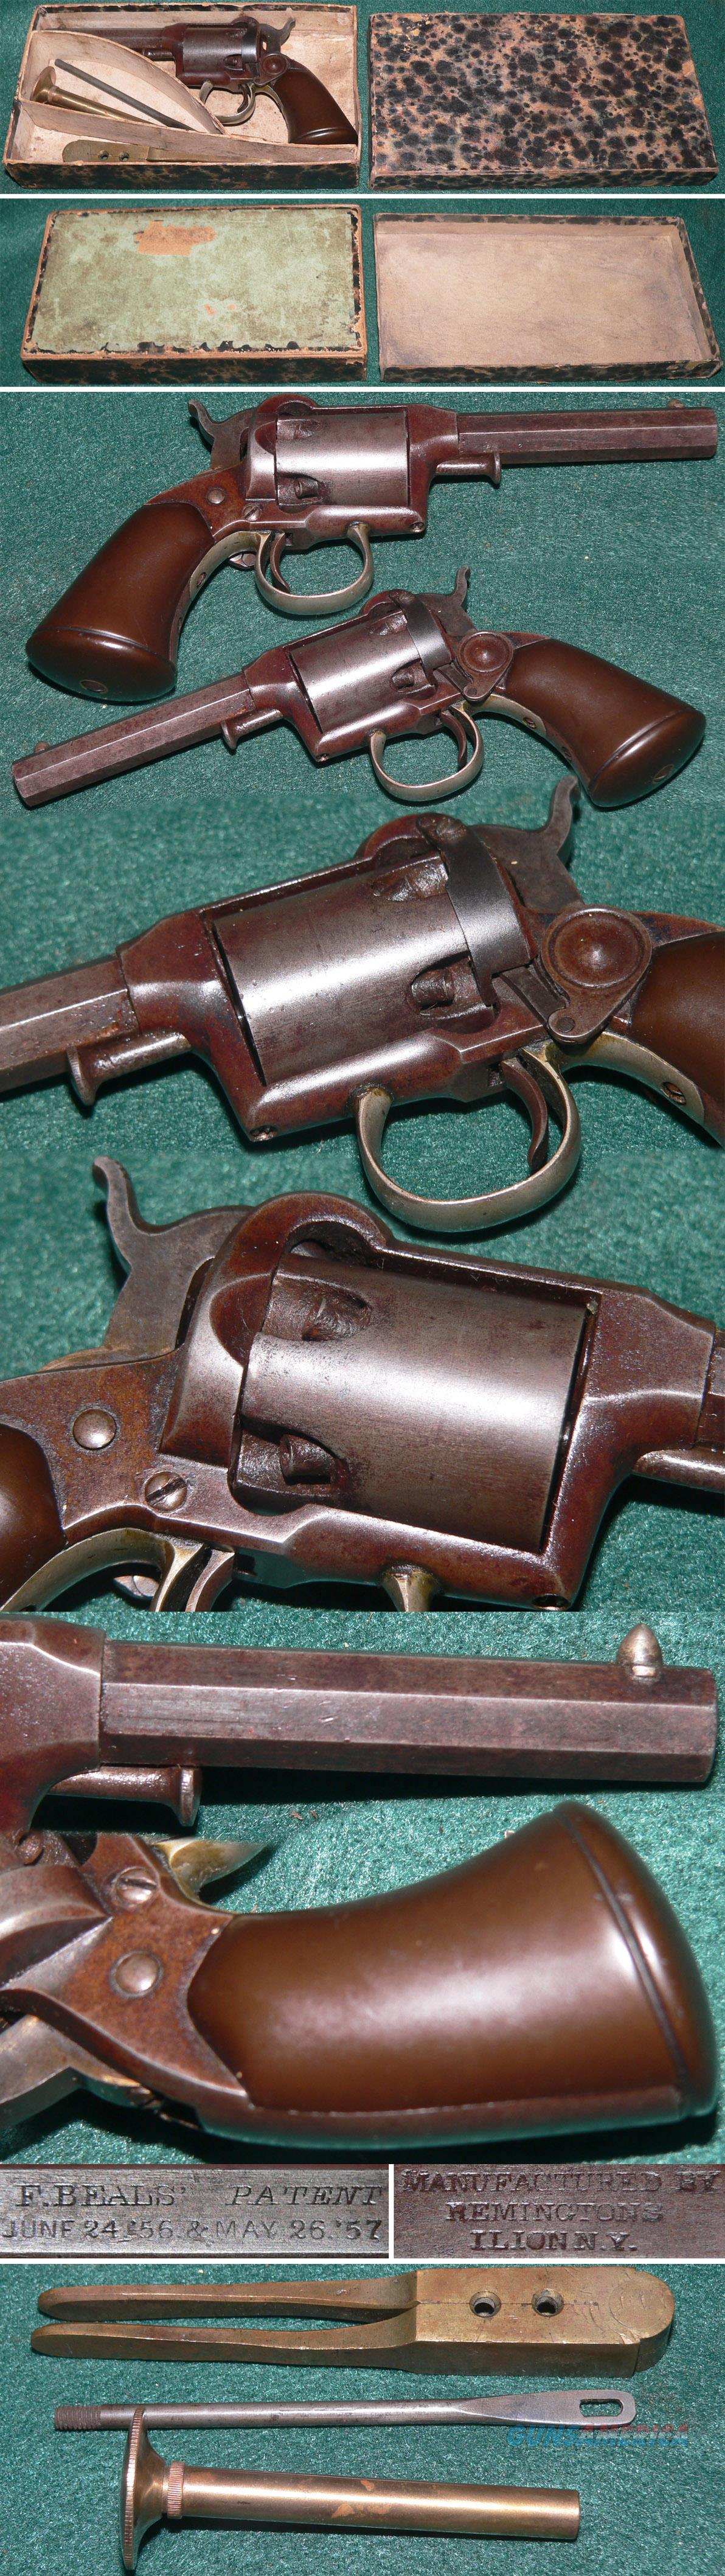 Remington 1st Model Beals pocket revolver in original box  Guns > Pistols > Remington Pistols - Pre-1899